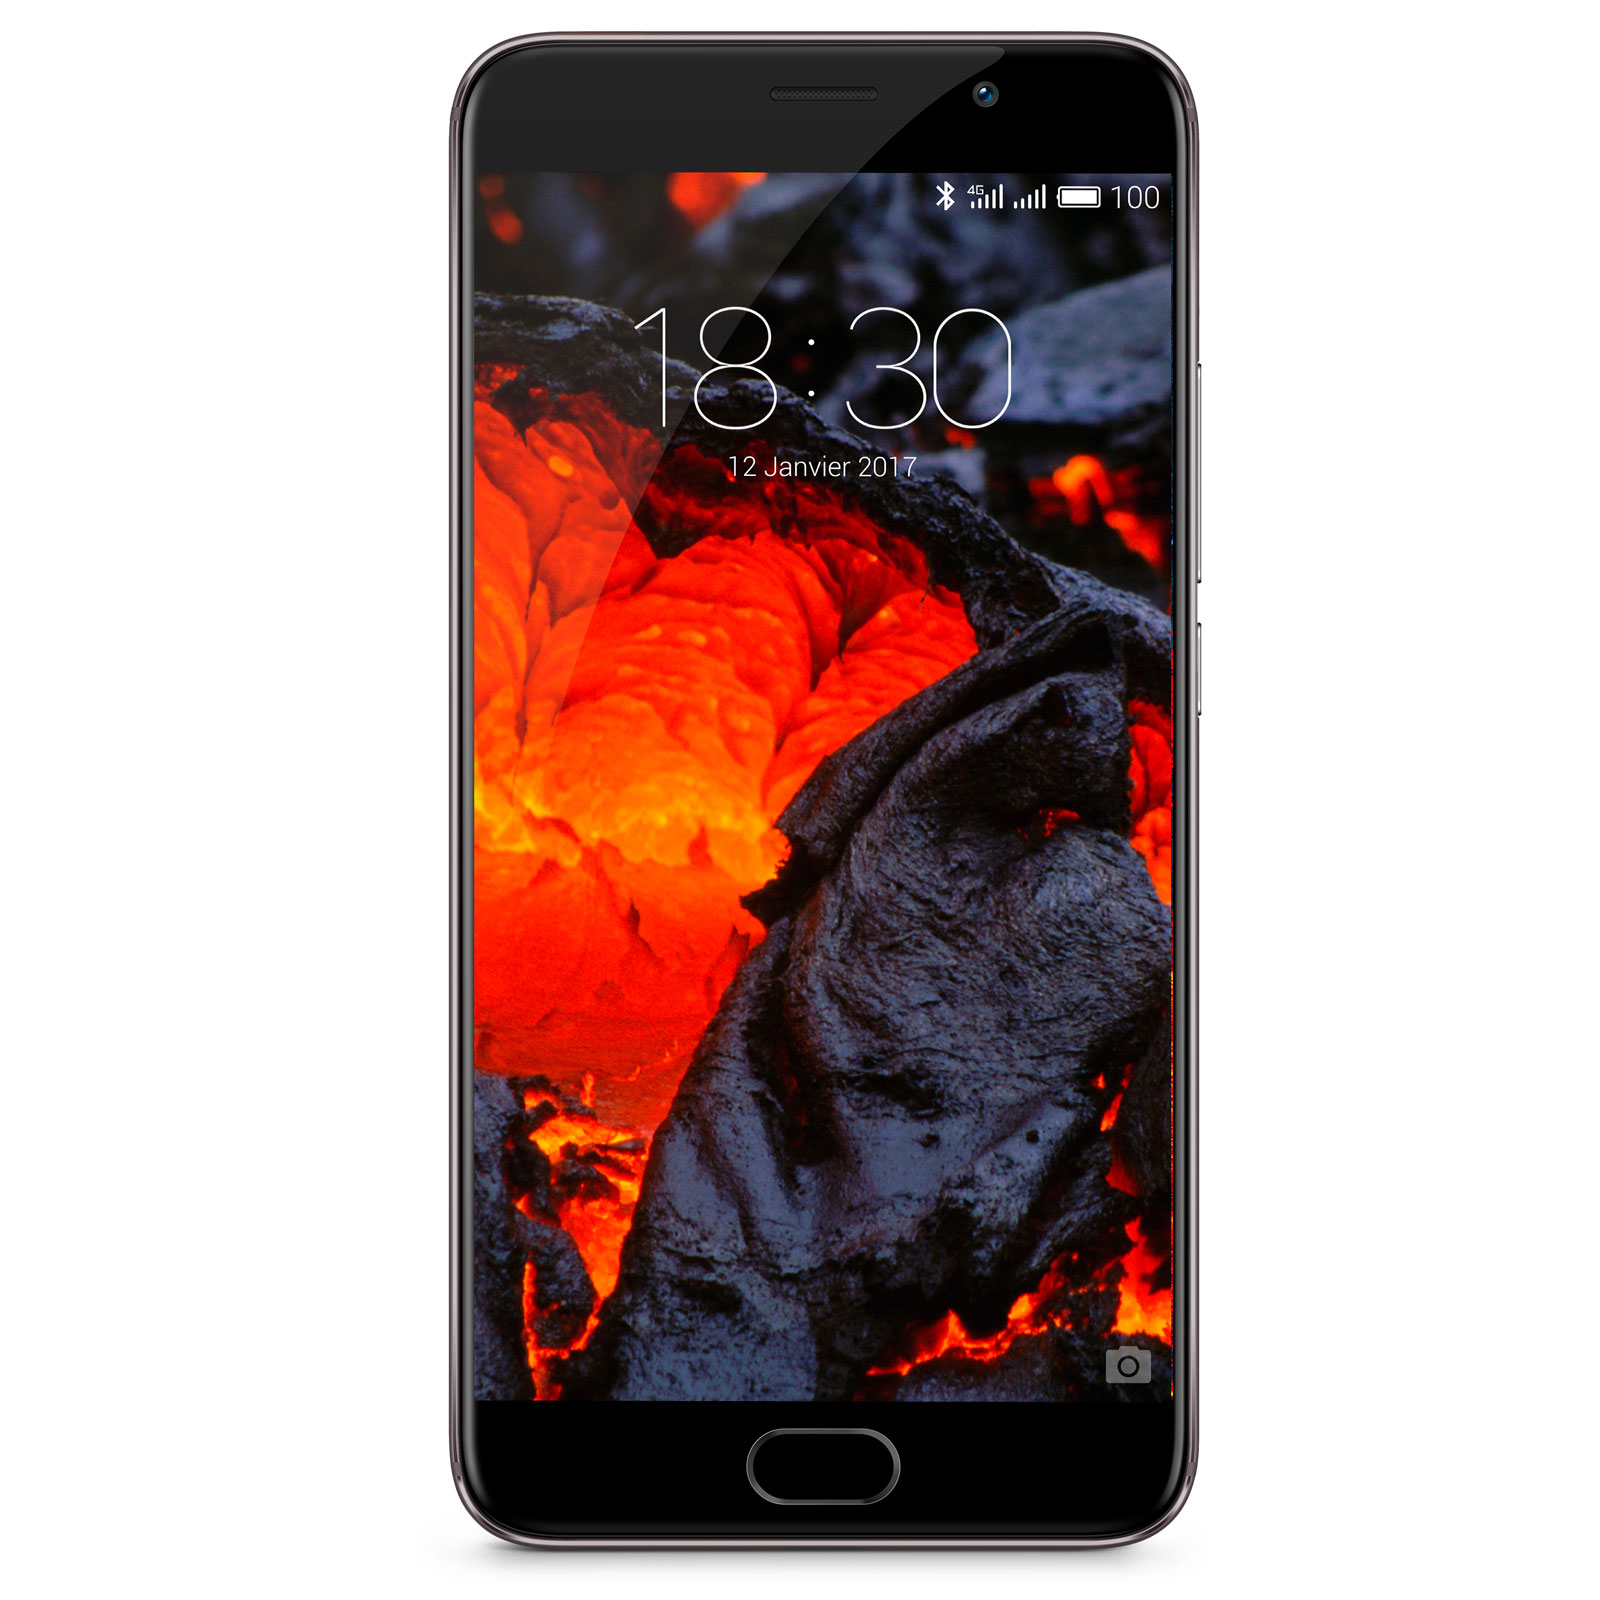 "Mobile & smartphone Meizu Pro 6 Plus Gris Smartphone 4G-LTE Advanced Dual SIM - Exynos 8890 8-Core 2.0 Ghz - RAM 4 Go - Ecran tactile 5.7"" 1440 x 2560 - 64 Go - NFC/Bluetooth 4.0 - 3400 mAh - Android 6.0"